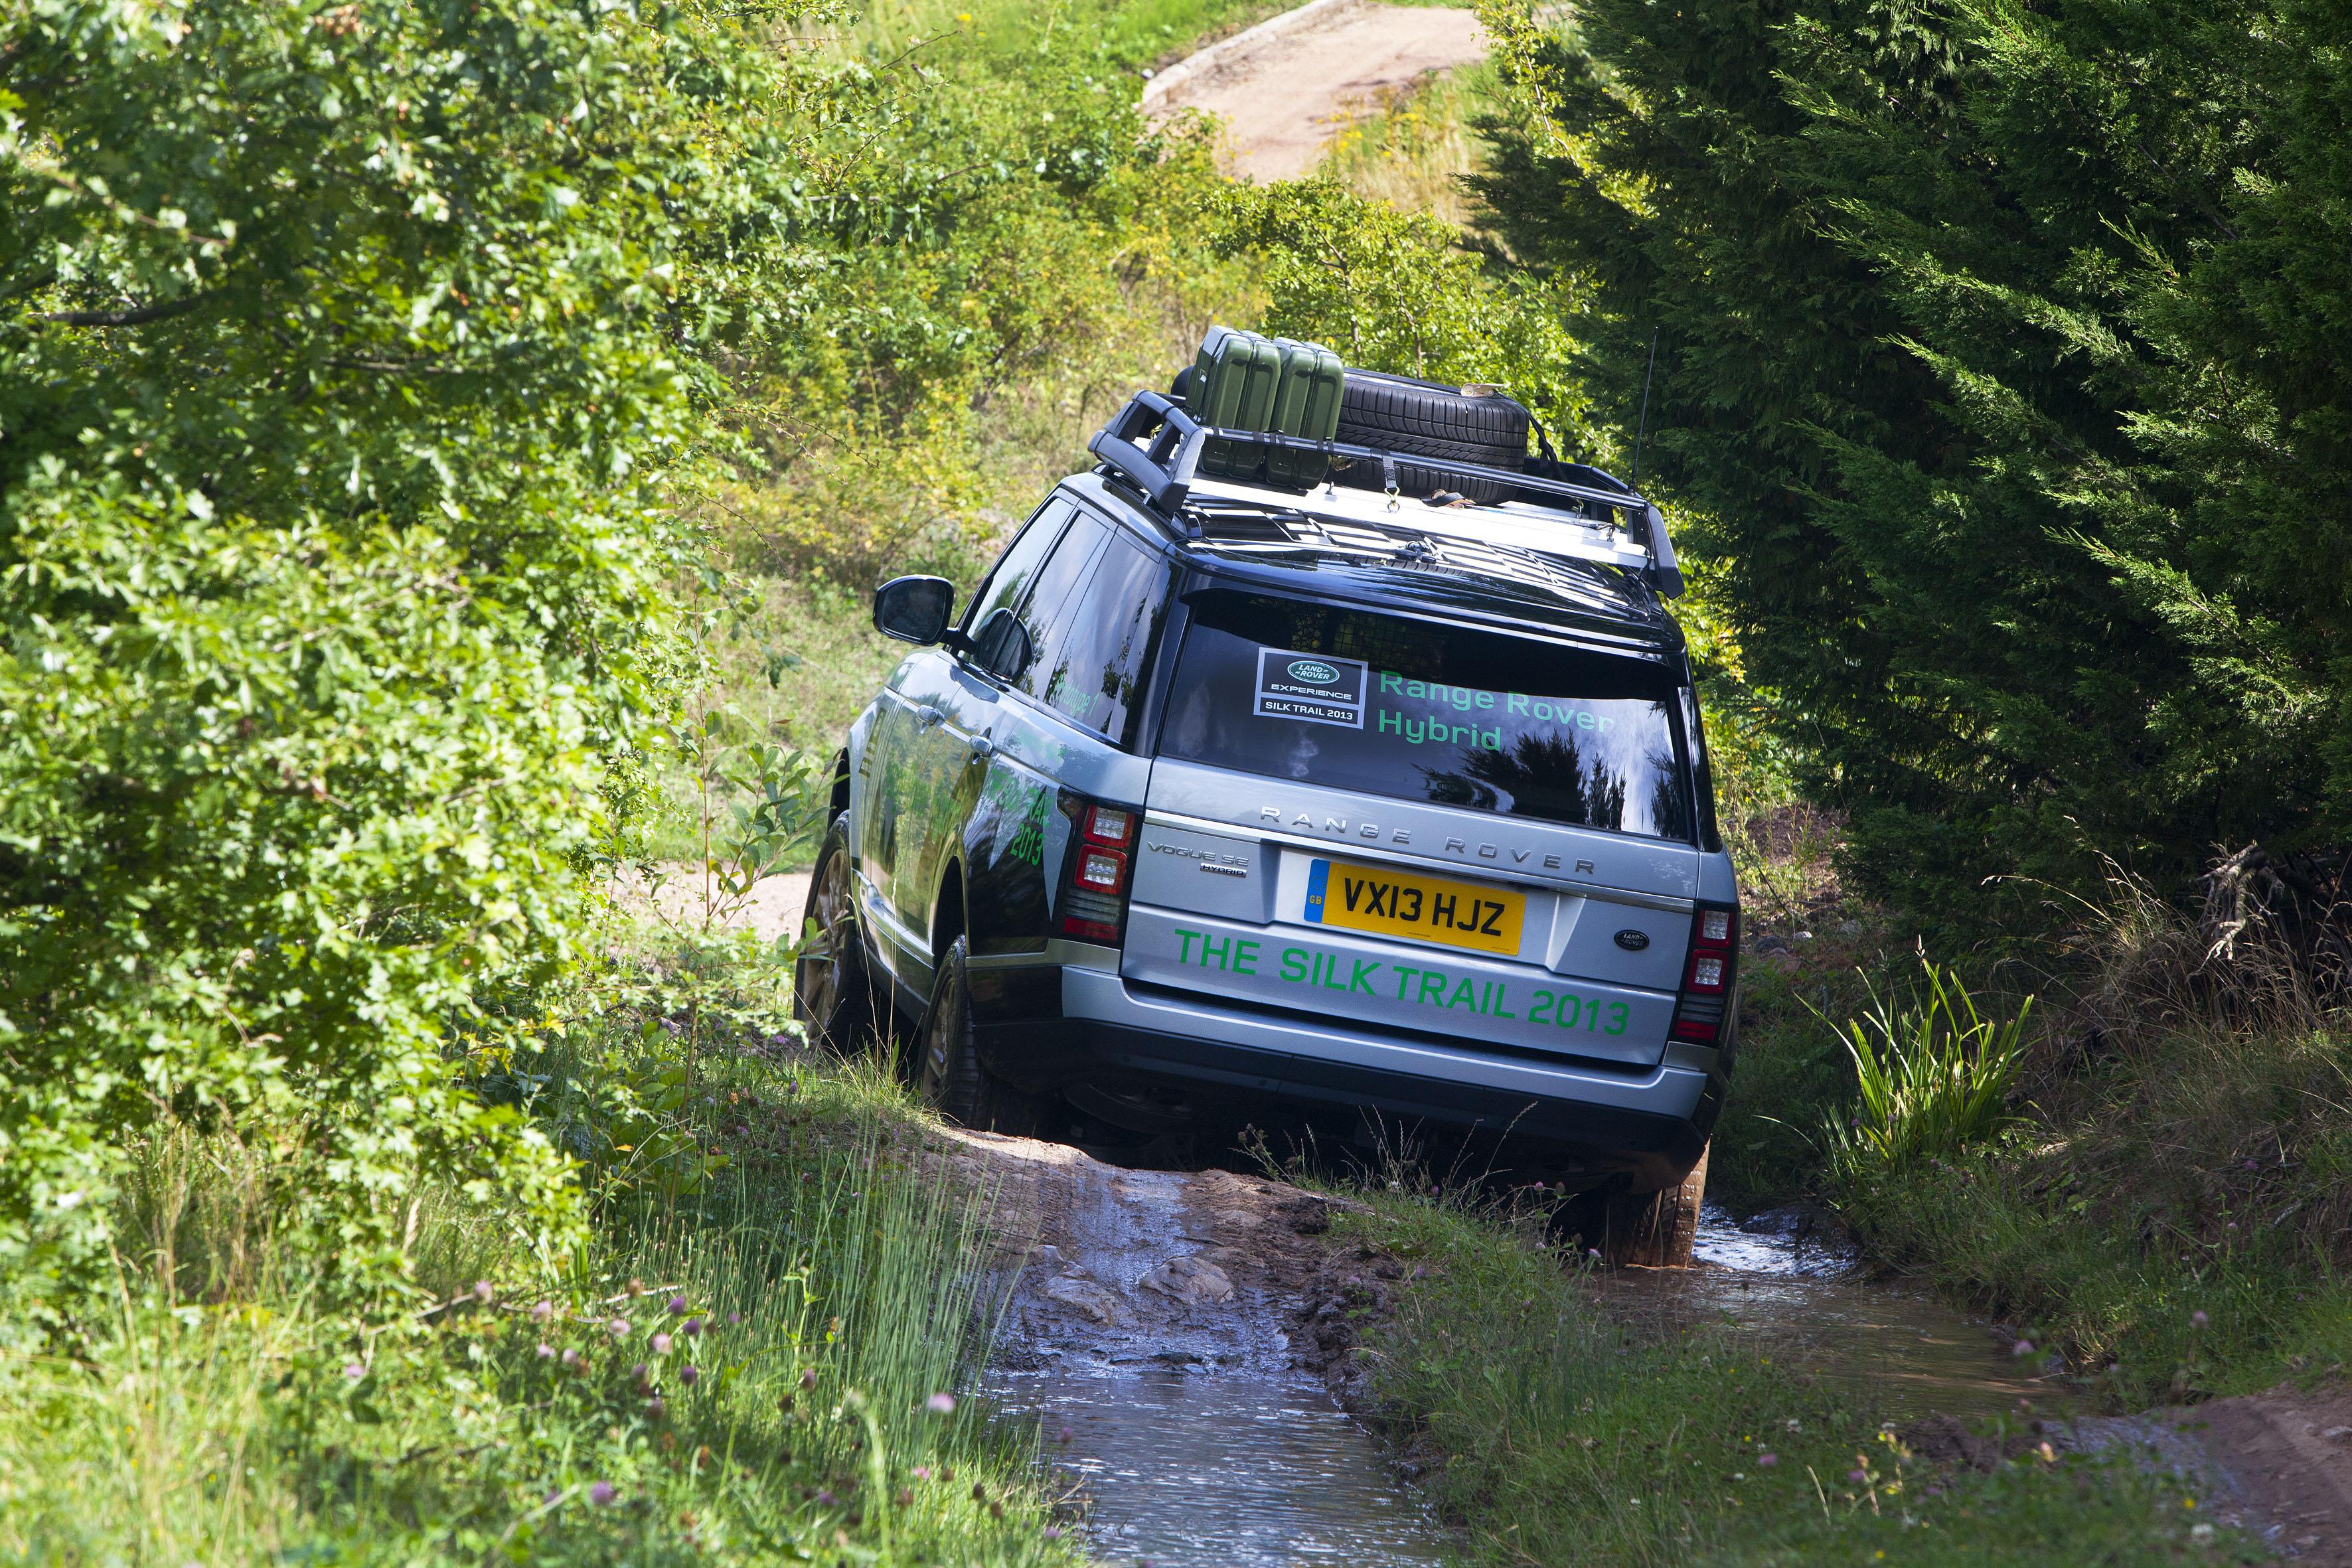 News Range Rover to Receive Diesel Hybrid Engine for US Market